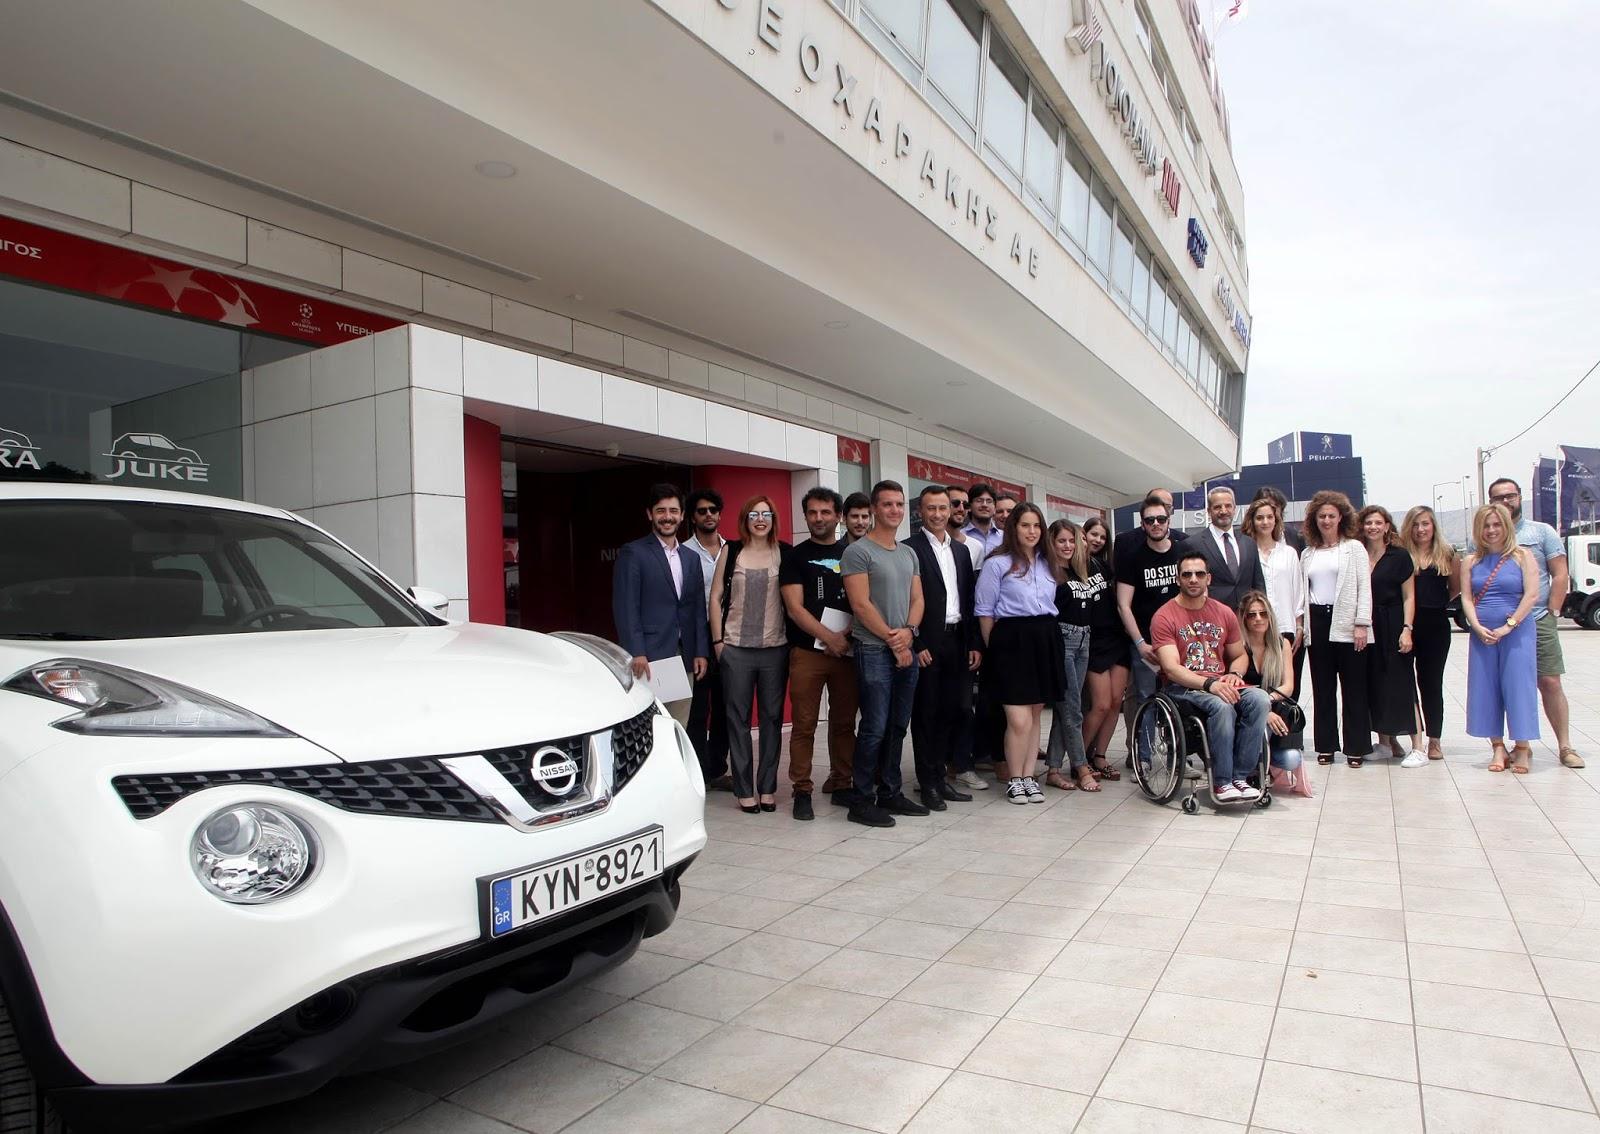 IMG 6119 Η Nissan βραβεύει με αυτοκίνητα του νικητές του GENERATION N ! Events, Future, Innovation, Nissan